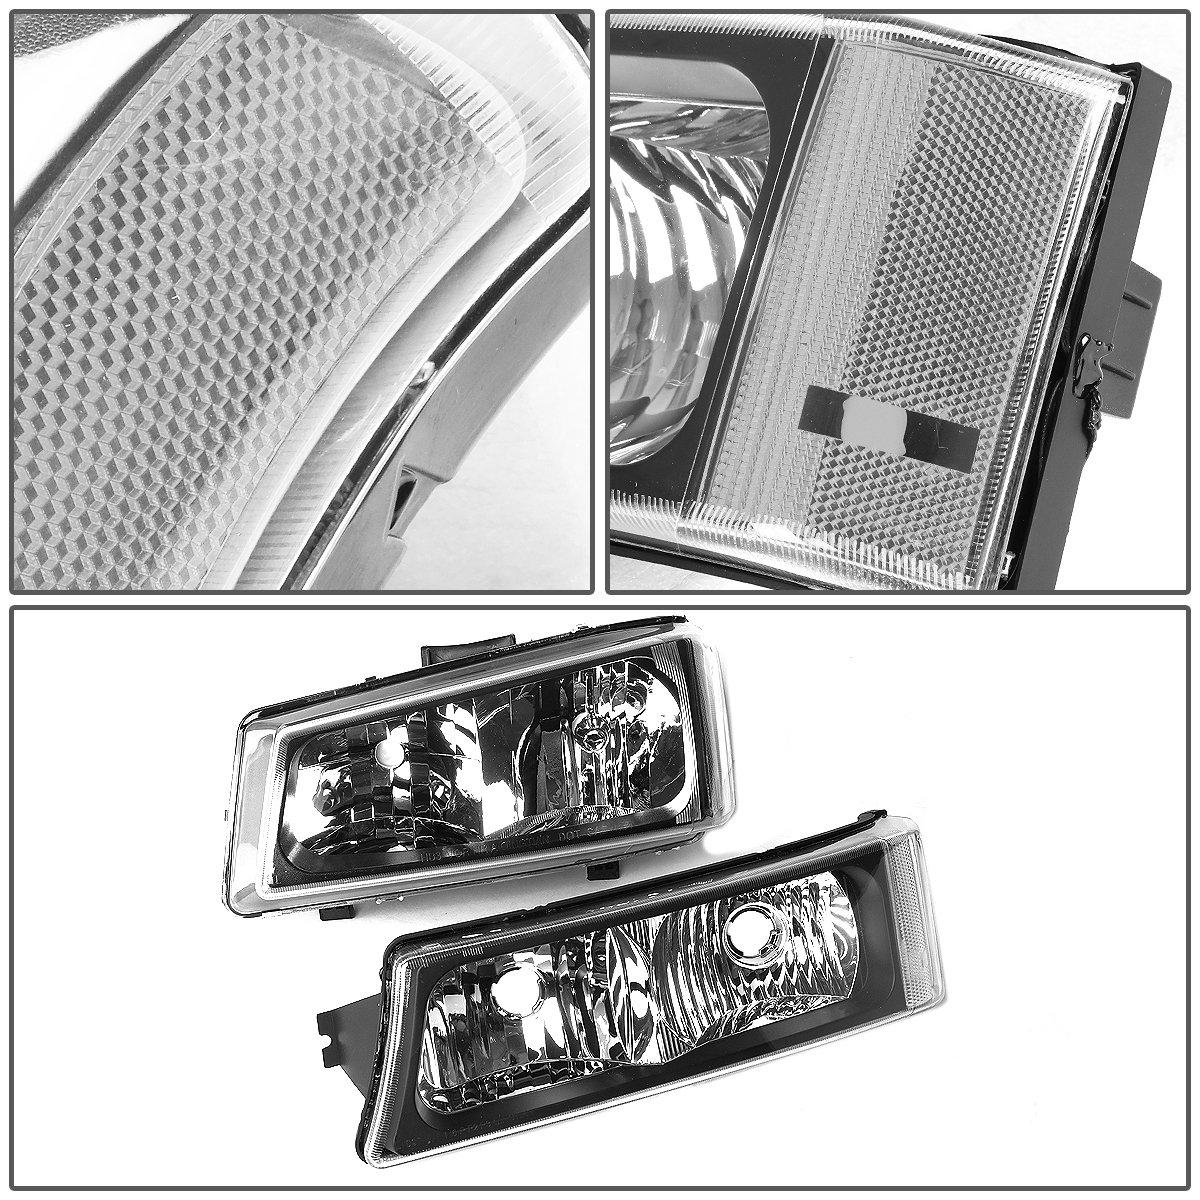 amazon dna motoring hl oh cs03 4p bk cl1 headlight assembly Chevy Colorado LED Lights amazon dna motoring hl oh cs03 4p bk cl1 headlight assembly driver passenger side automotive